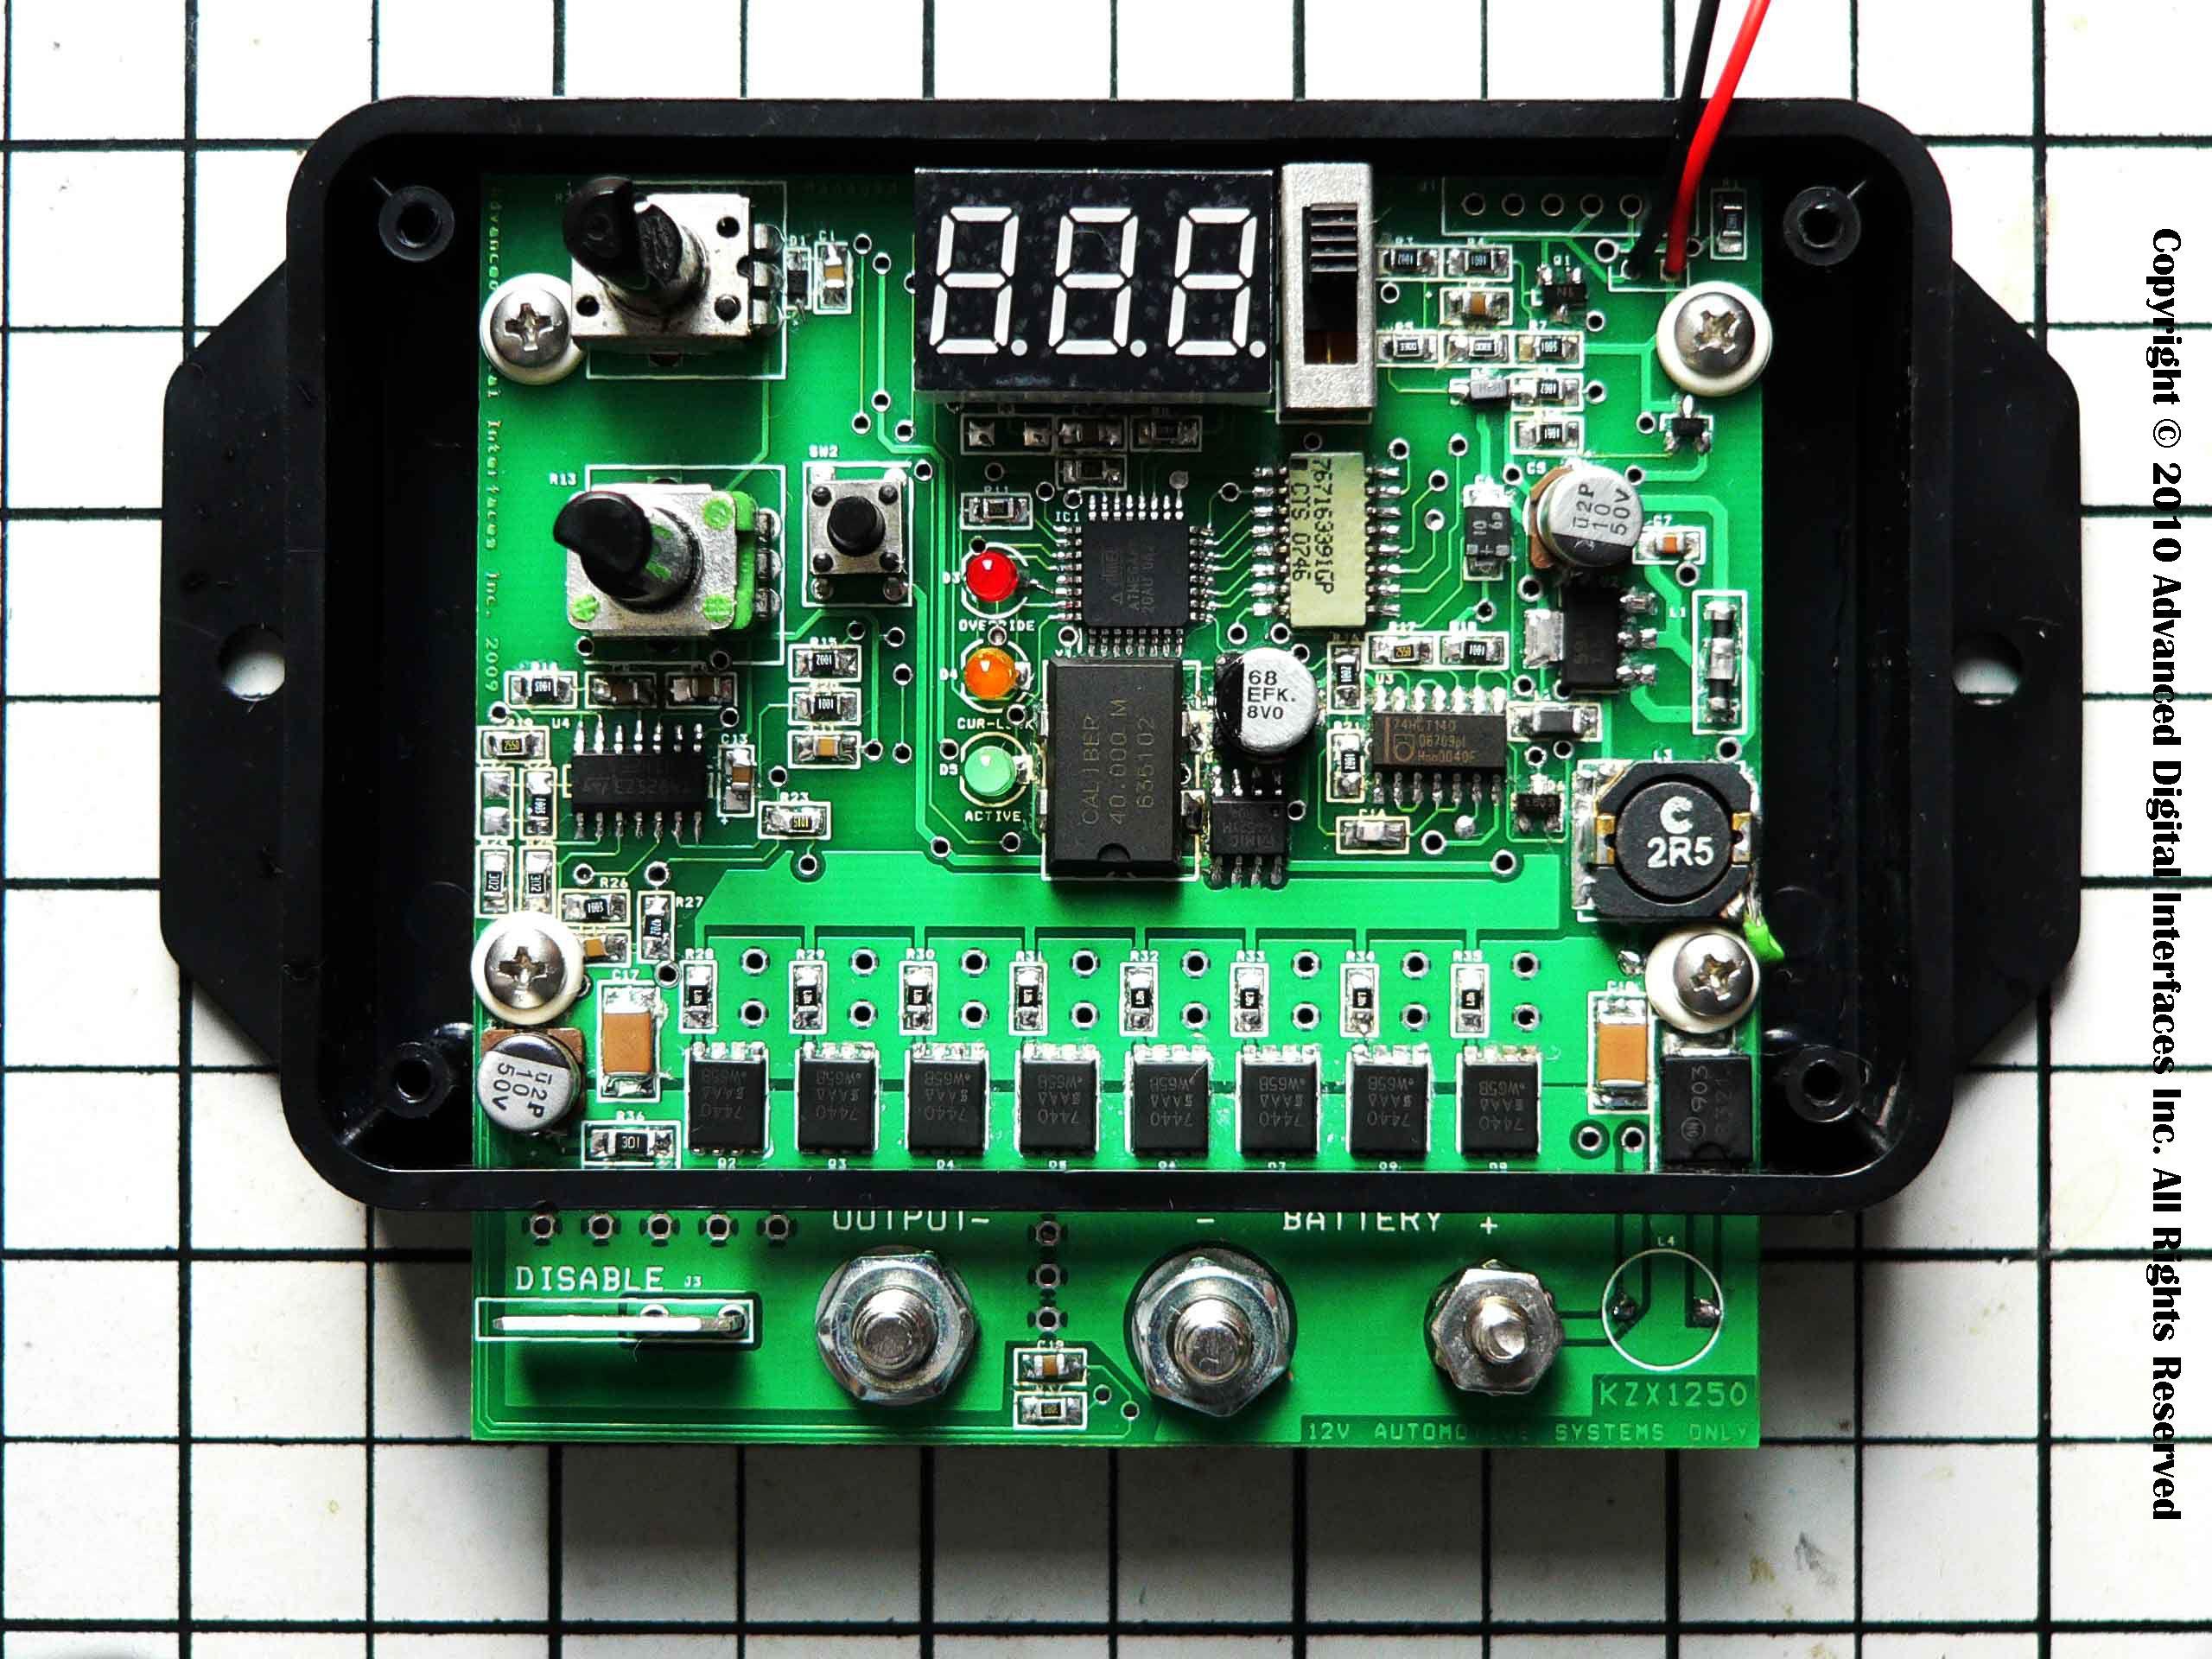 KZX1250 Intelligent Automotive PWM for HHO | KZX1250 Intelligent Automotive PWM For HHO